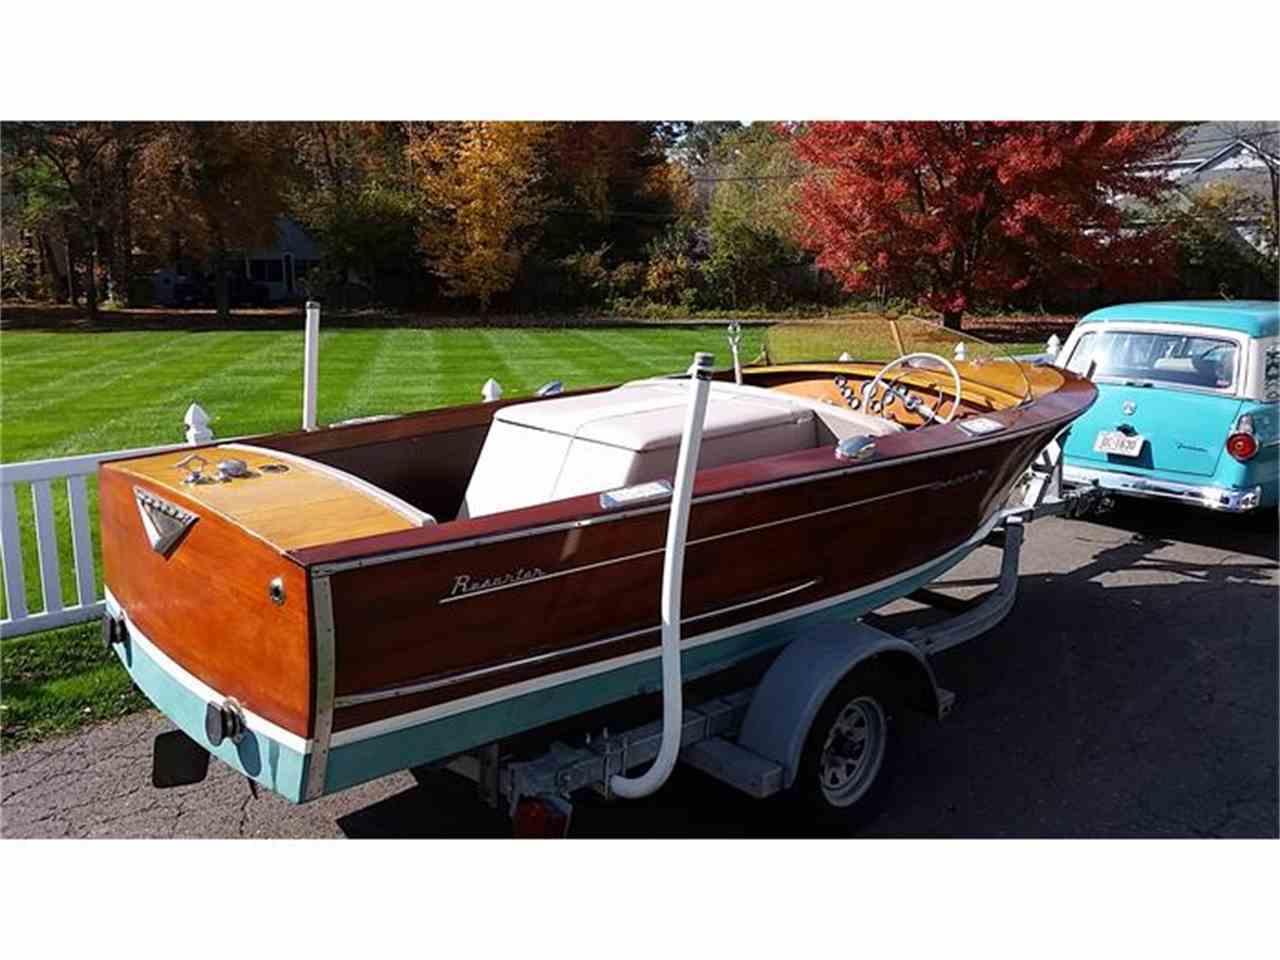 1958 century resorter boat for sale cc for Classic motor cars of ellington